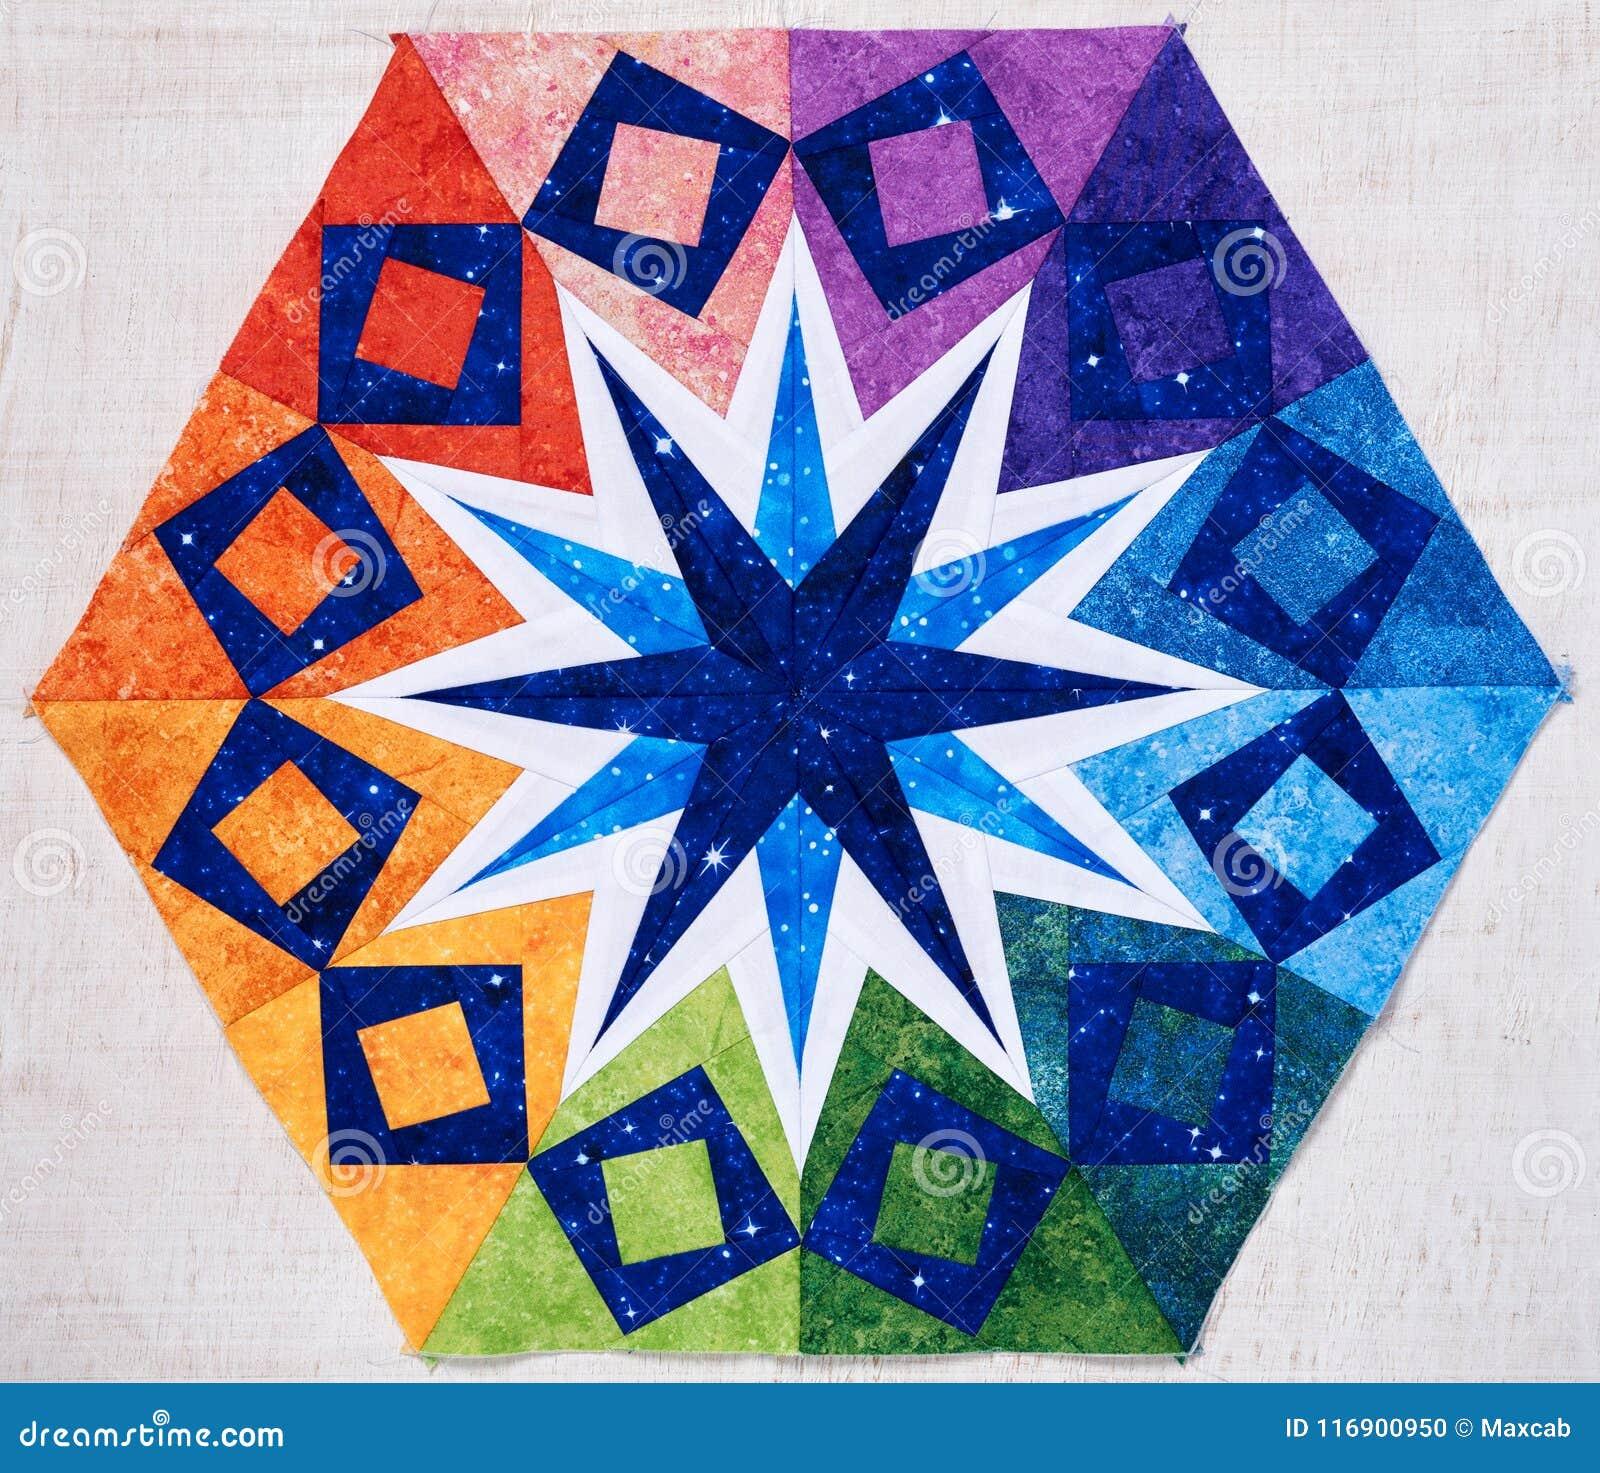 Hexagon patchwork block like kaleidoscope, detail of quilt